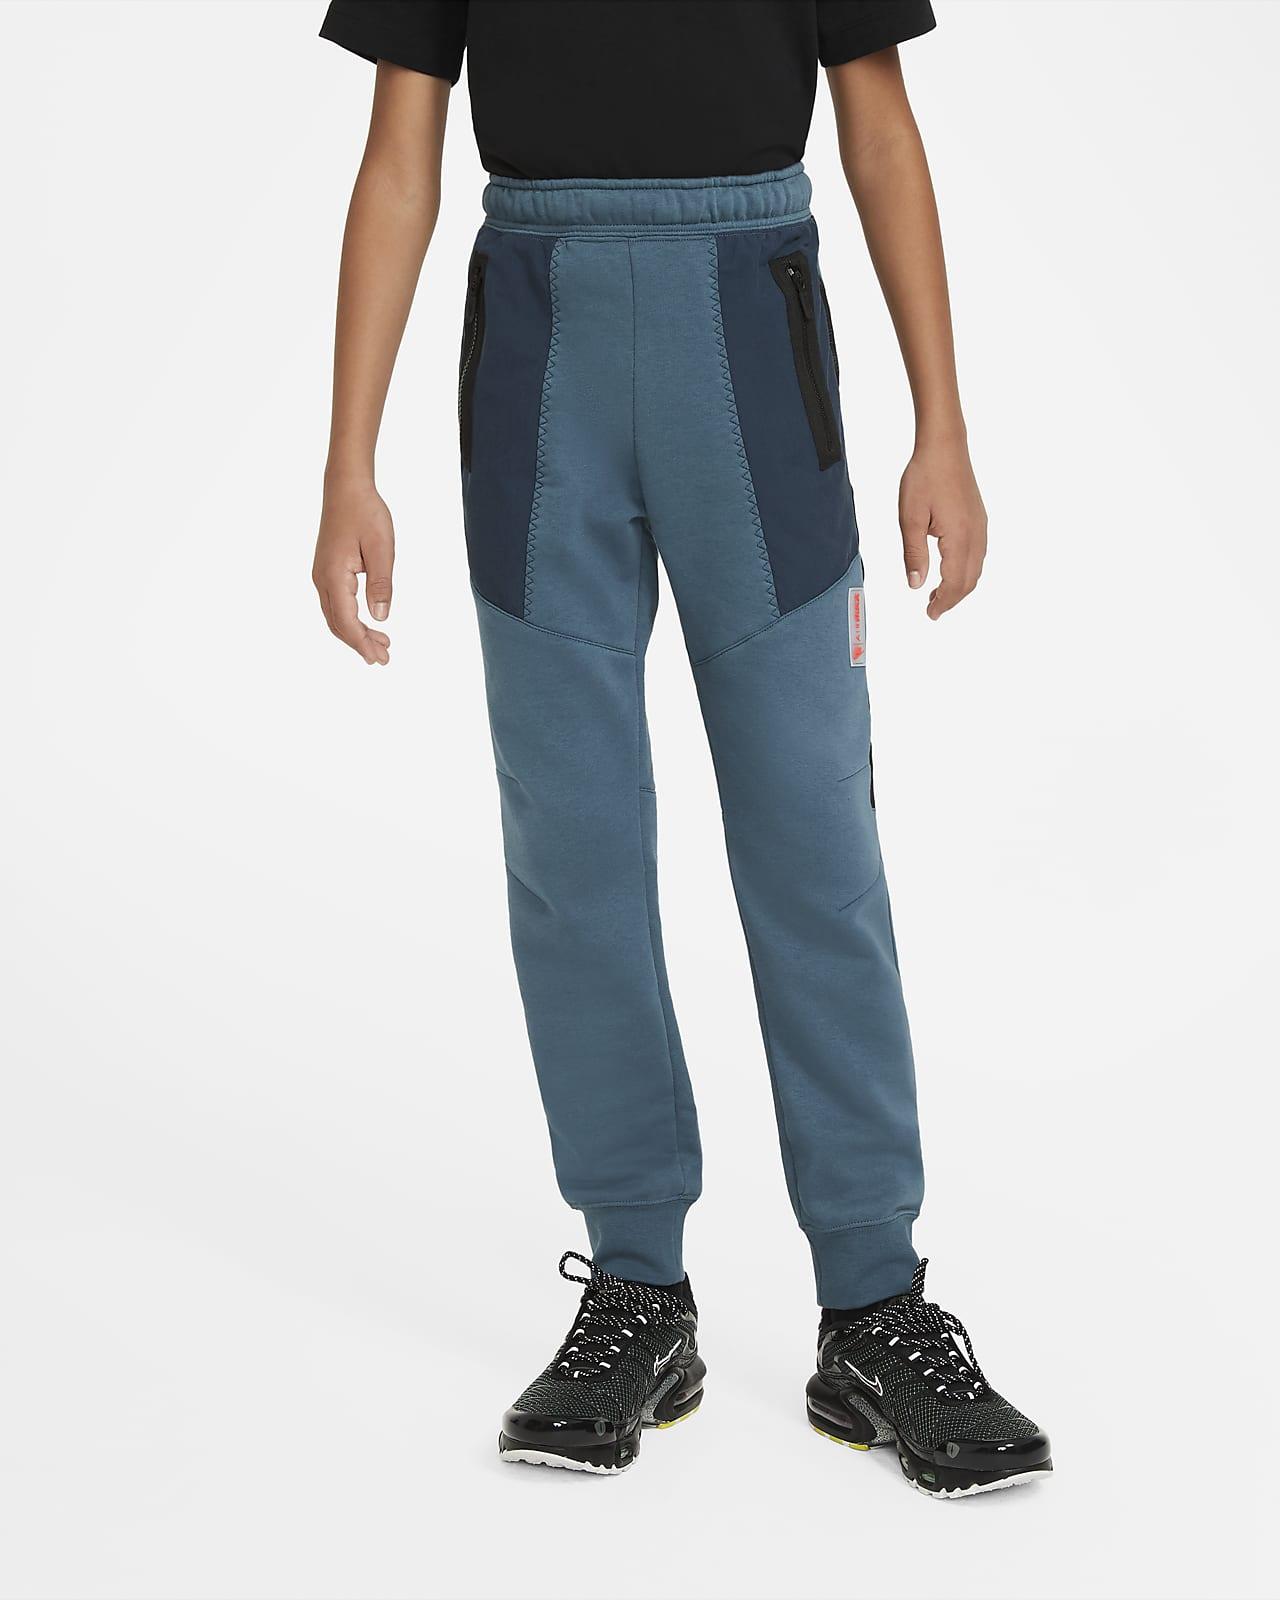 Nike Sportswear Air Max-fleecebukser til store børn (drenge)